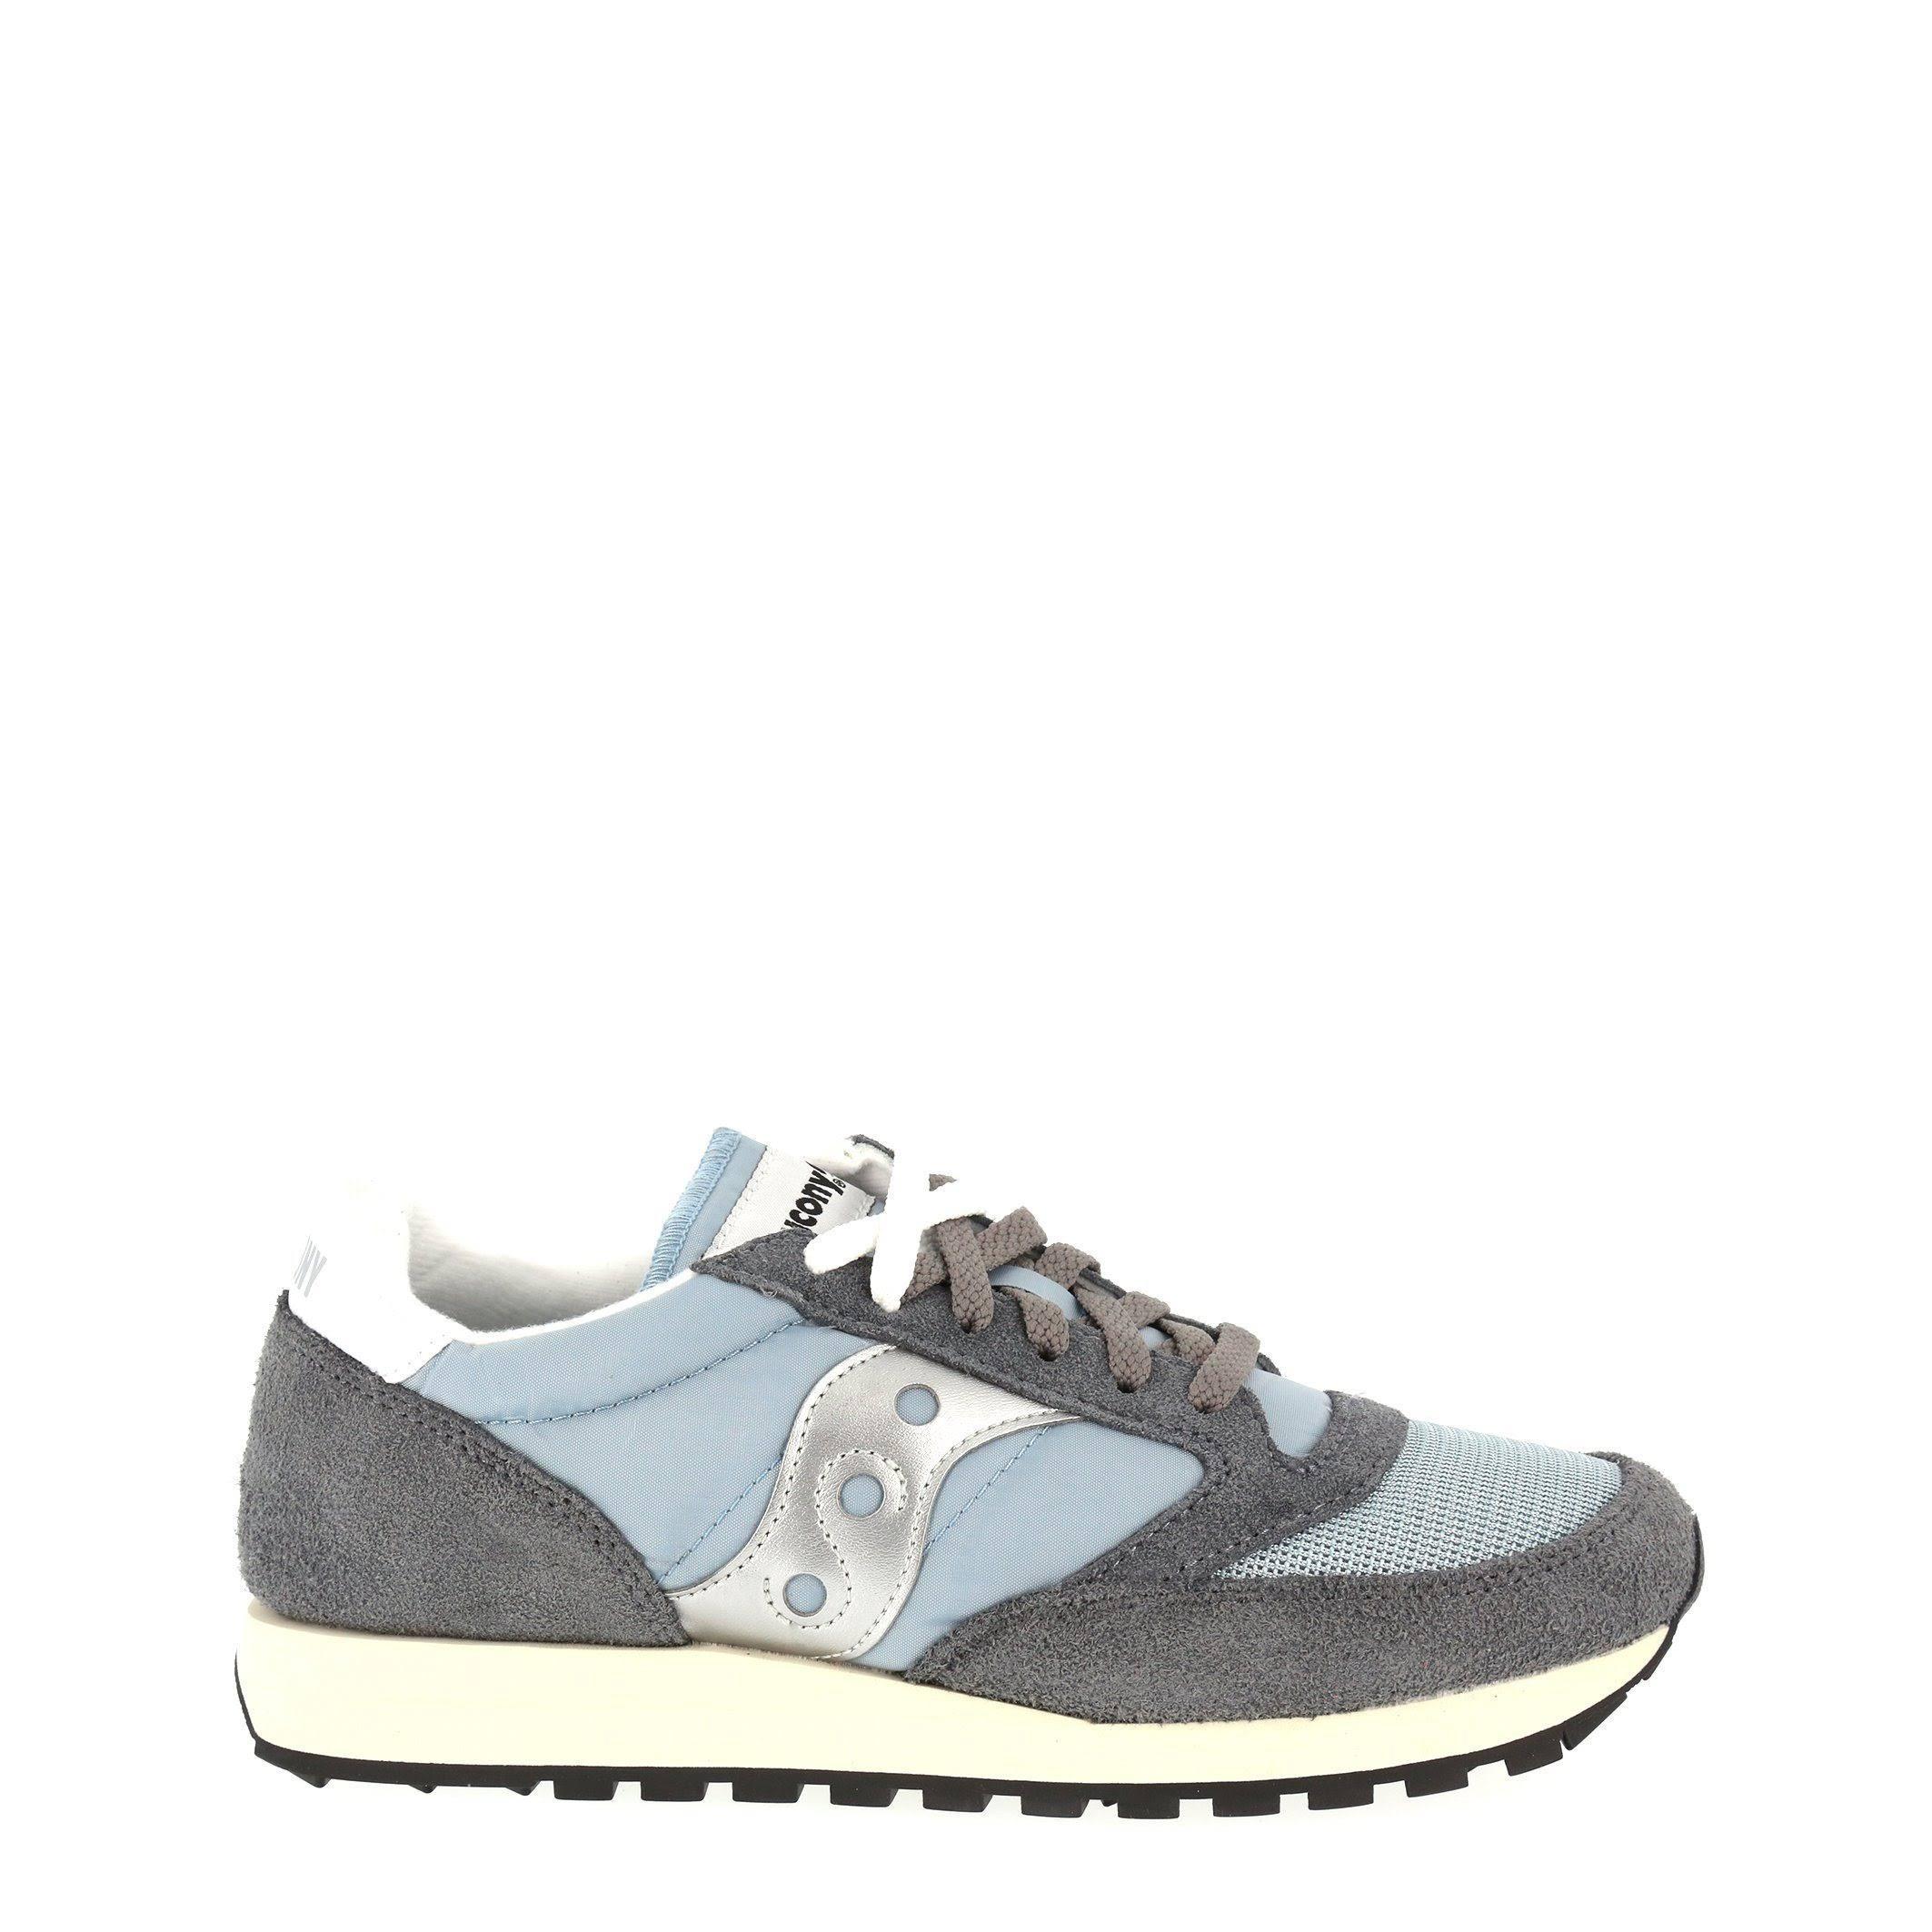 5 Saucony Jazz Azul S7036839 Original Gris Blanco 8 Vintage Shoes xRPZCq